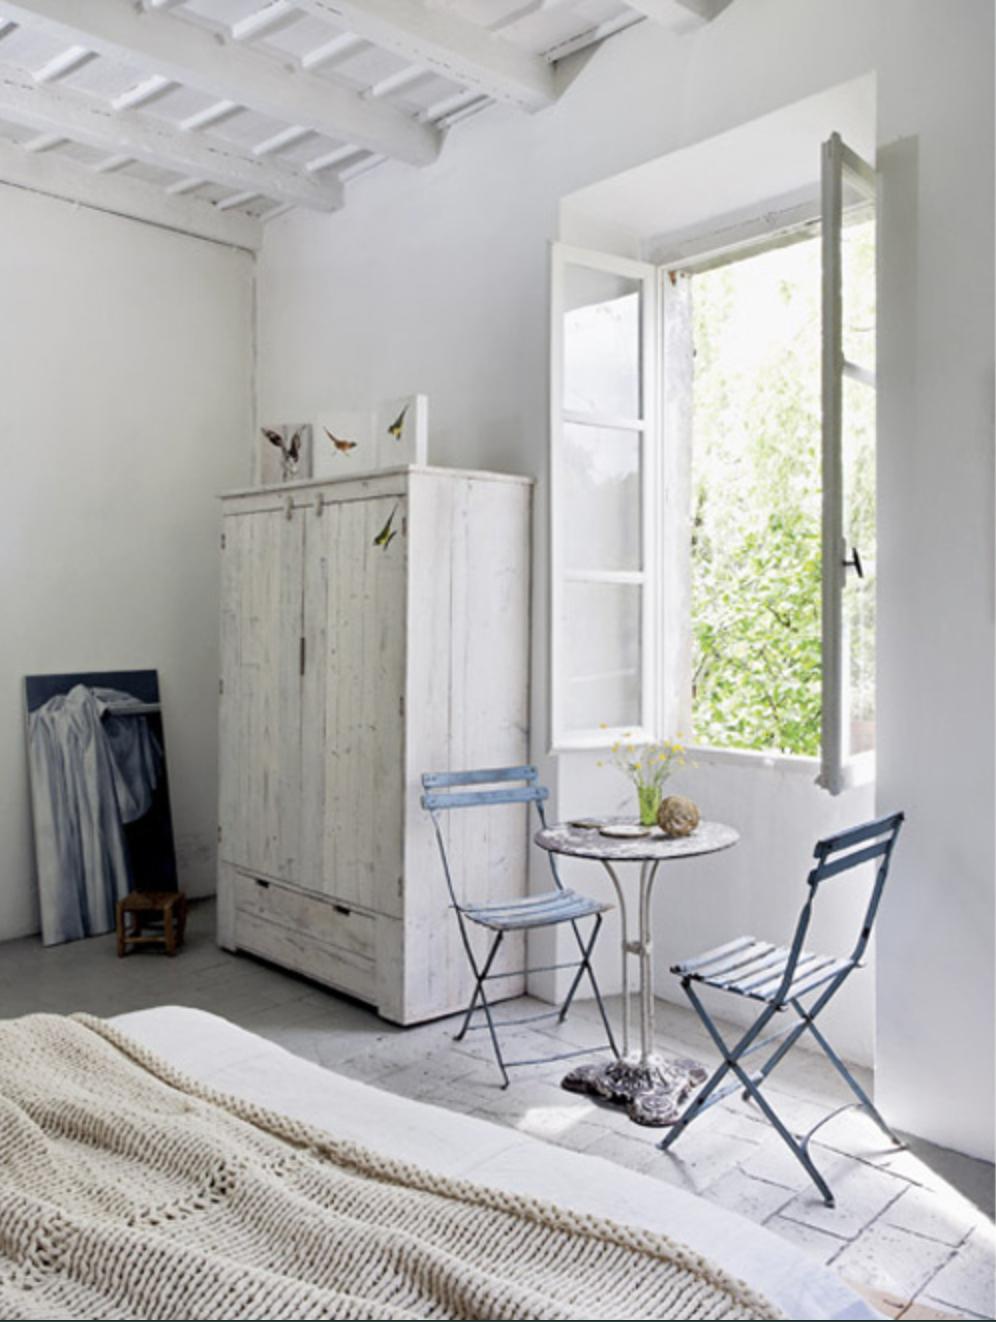 einrichten sweet home. Black Bedroom Furniture Sets. Home Design Ideas